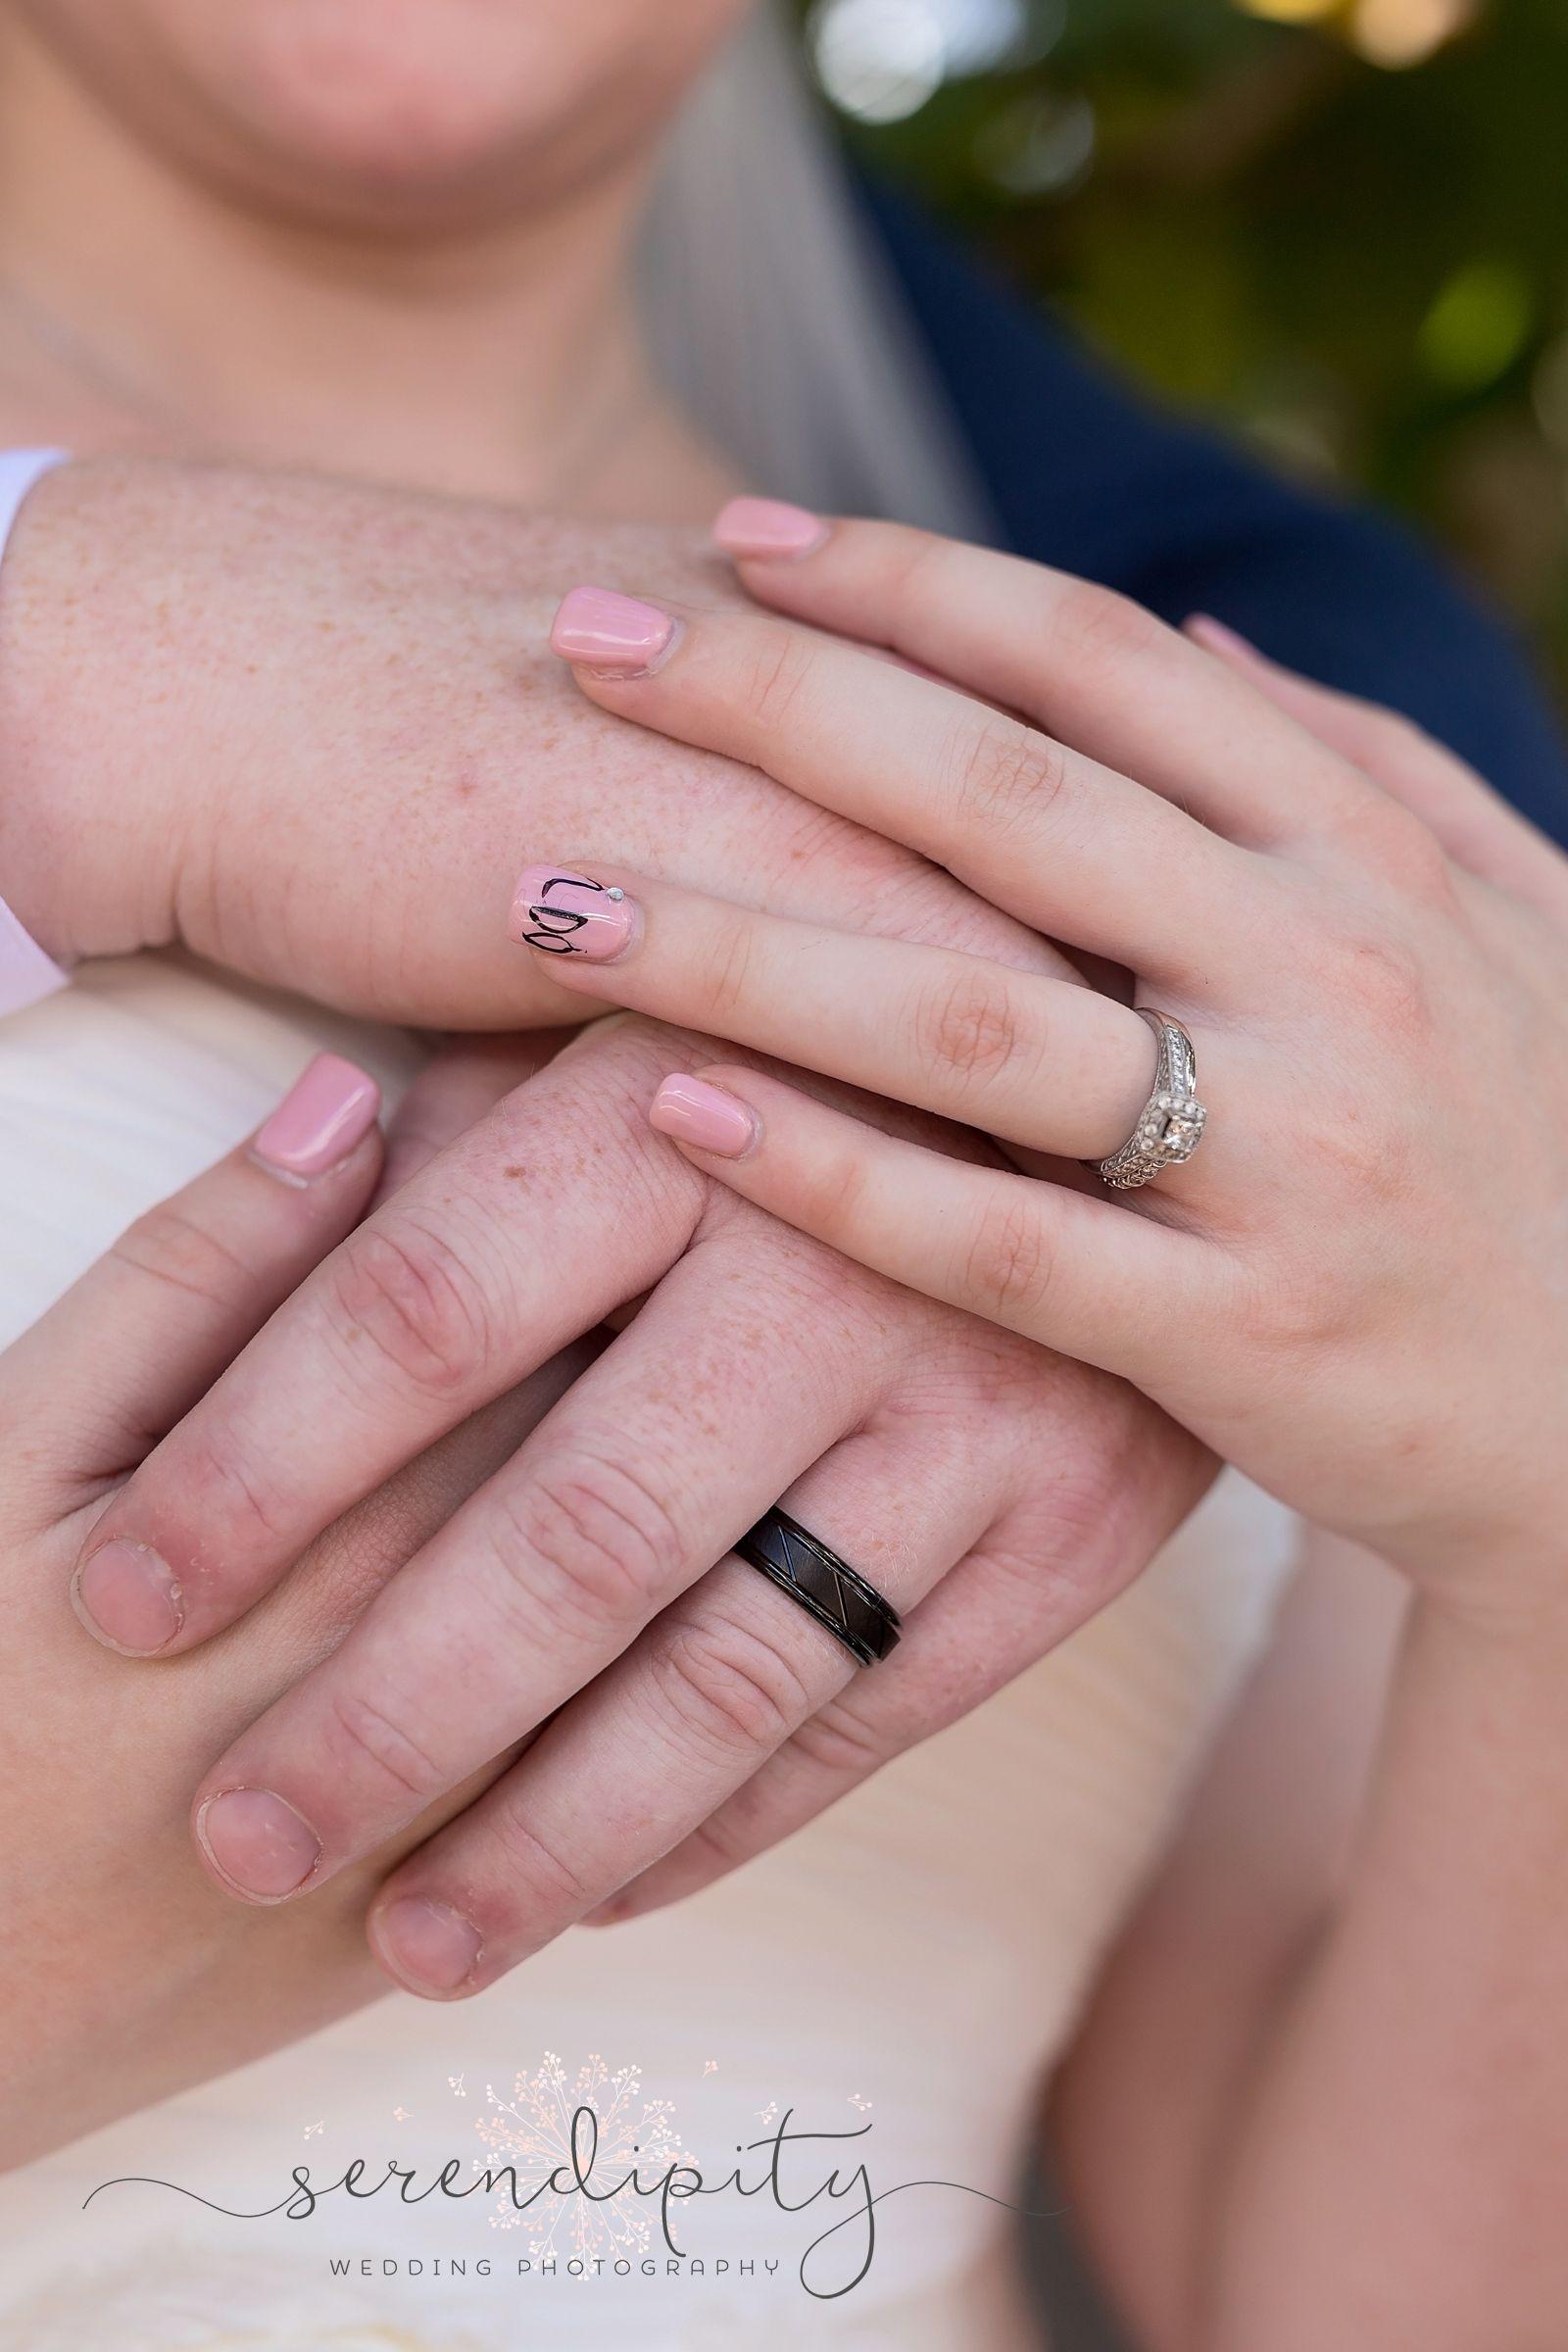 Weddings, wedding photography, wedding photographer, wedding rings ...